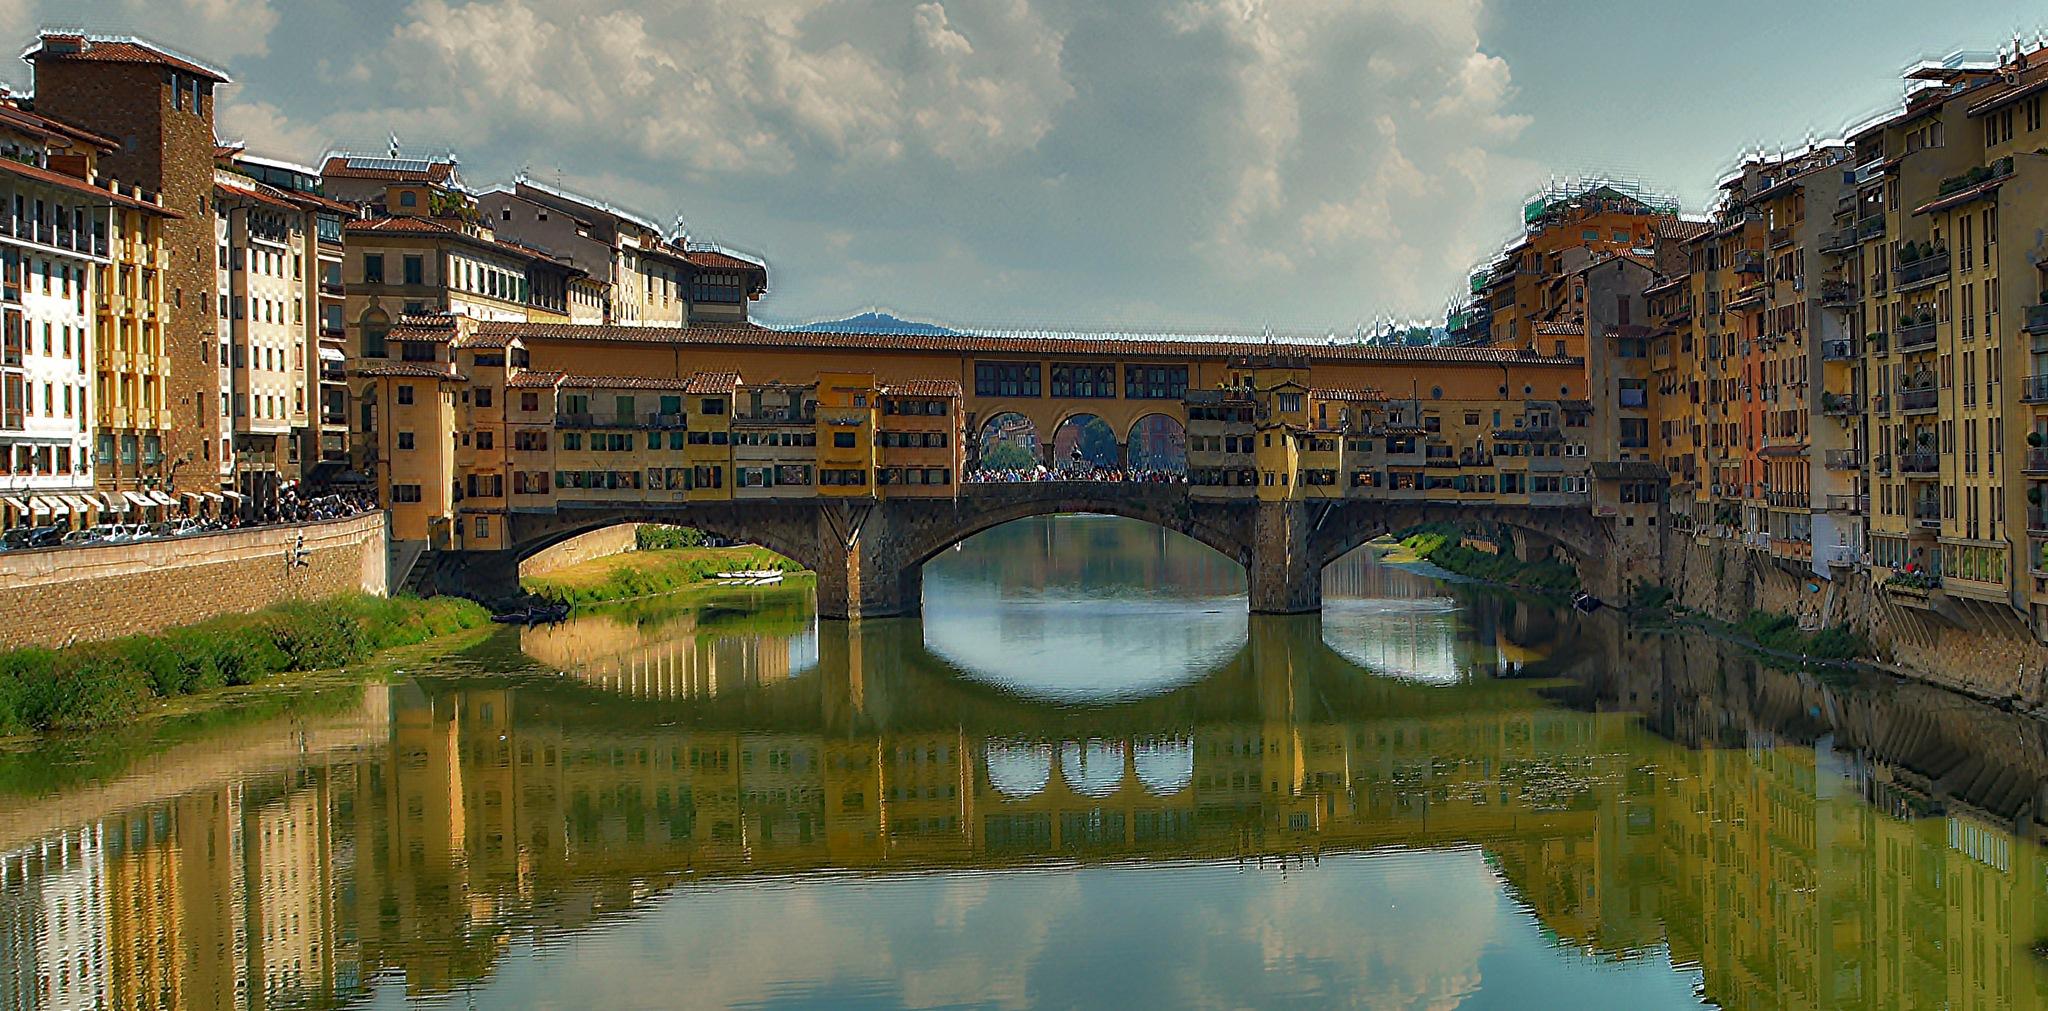 Ponte vecchio, Florence by MSchirmann